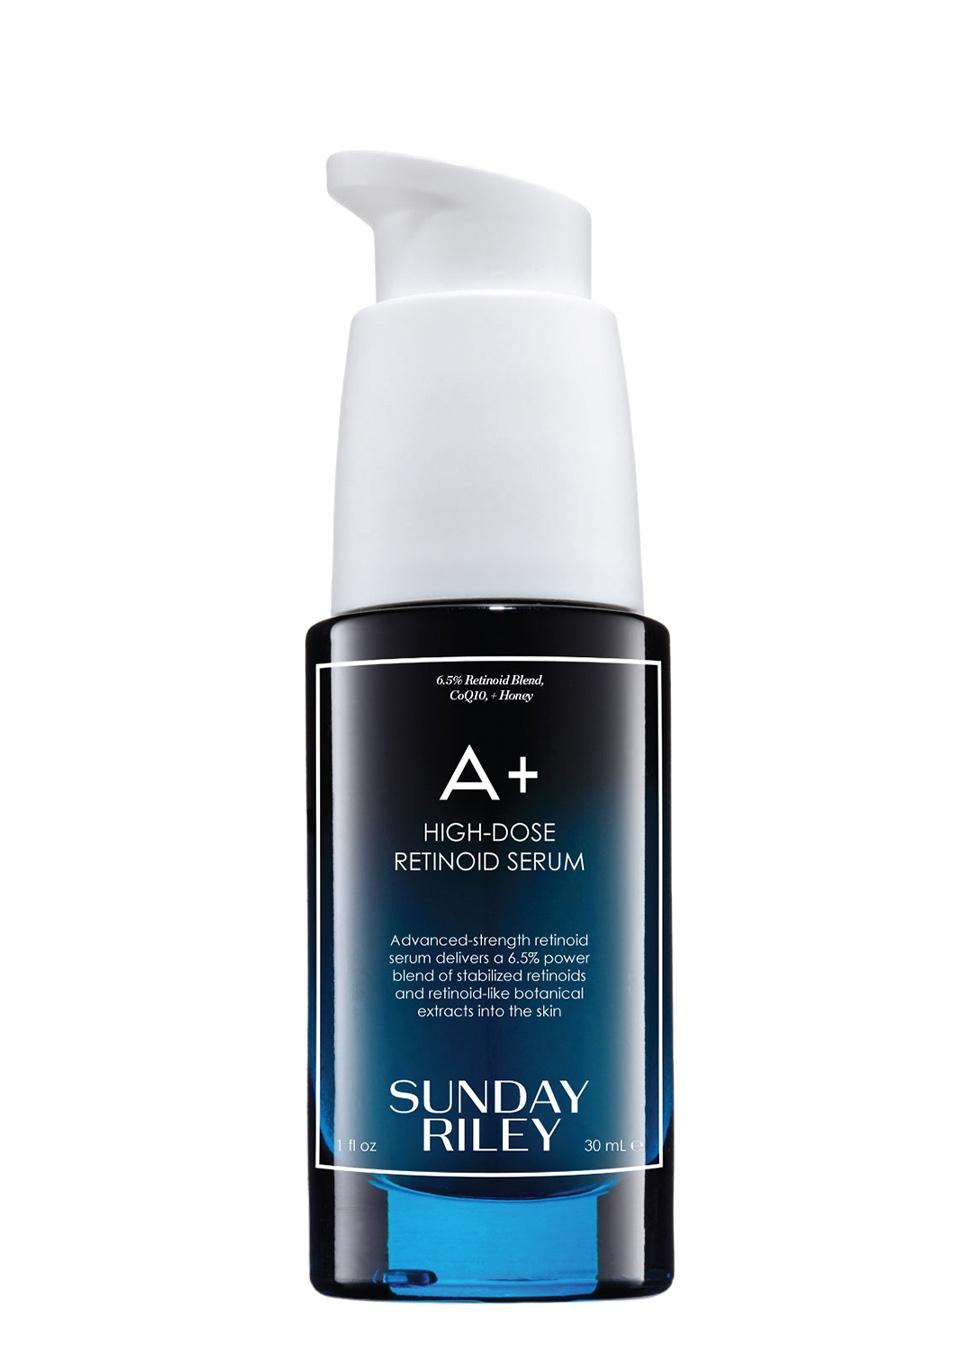 A+ High-Dose Retinoid Serum 30ml